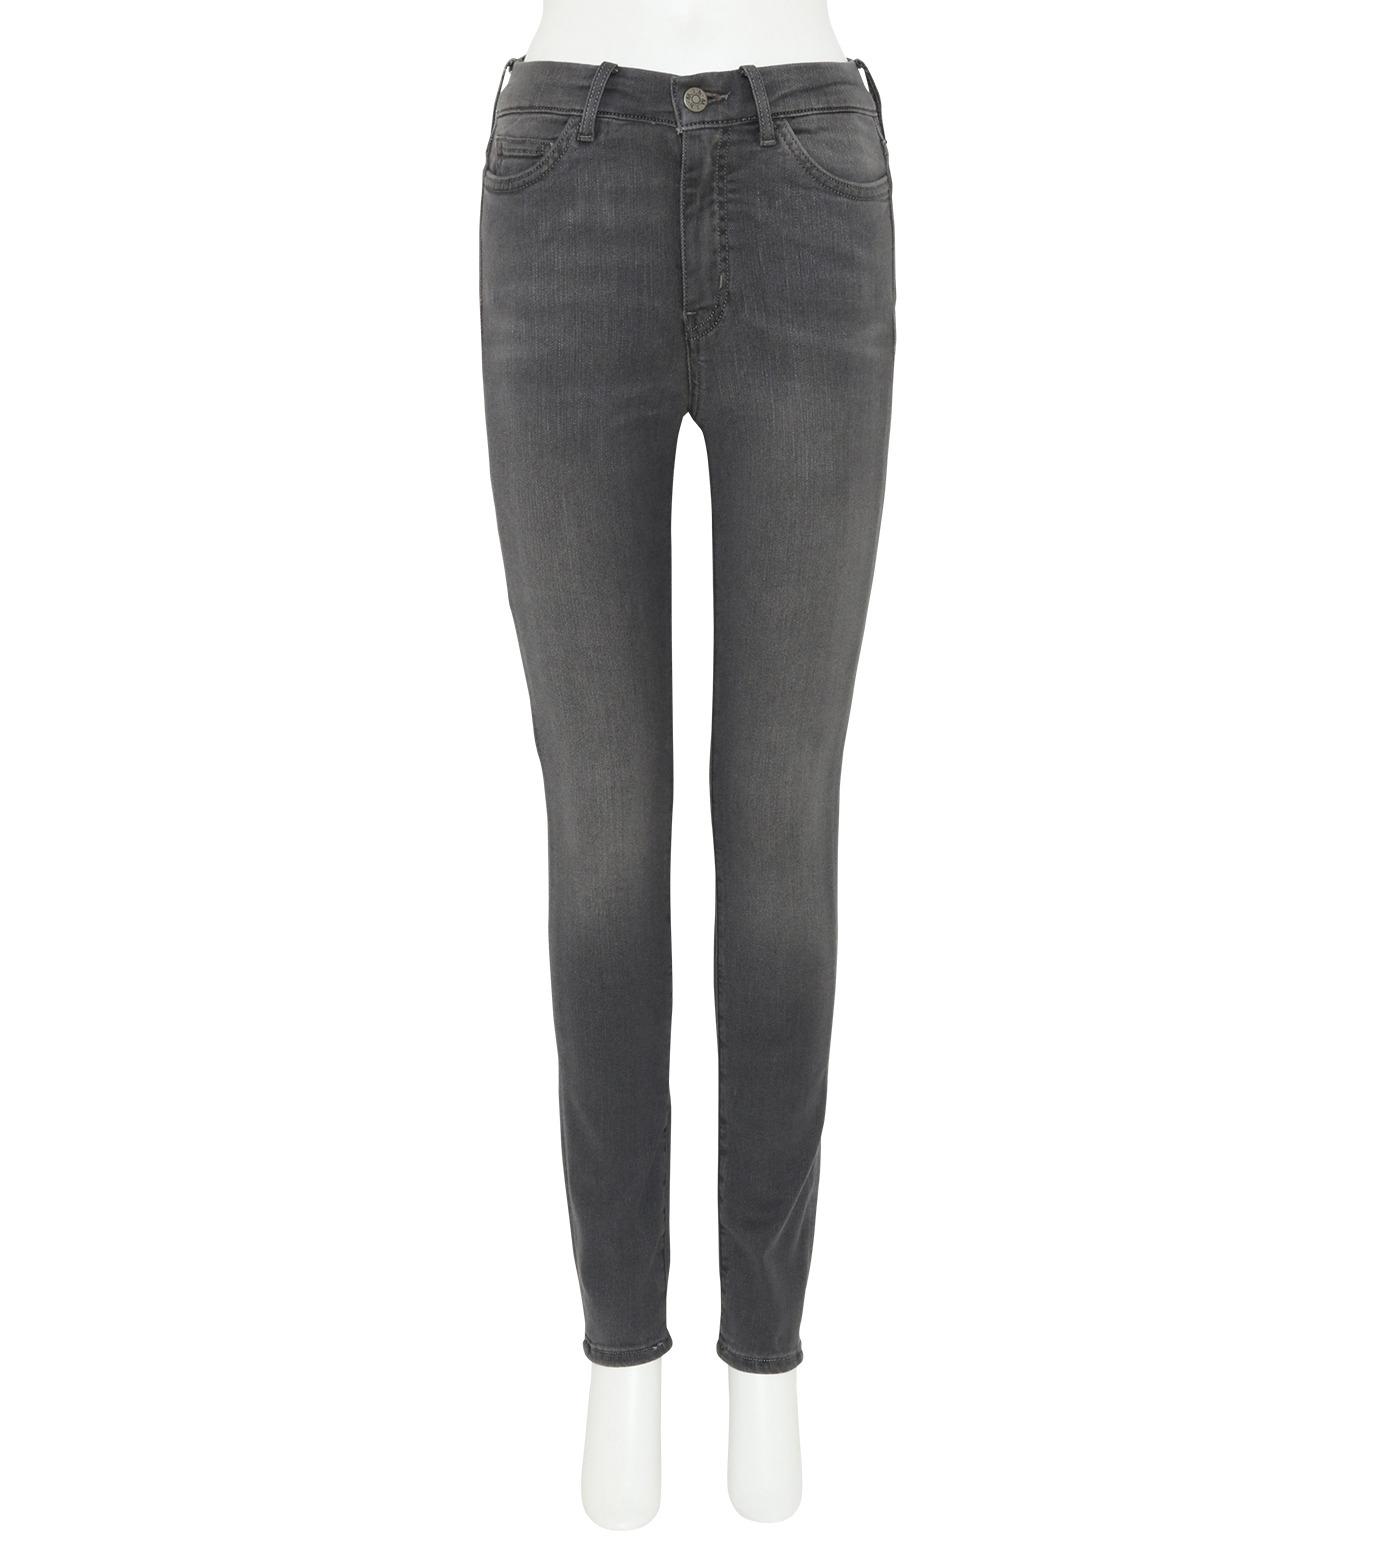 M.i.h Jeans(エムアイエイチジーンズ)のBodycon Skinny-GRAY(デニム/denim)-W2201106-11 拡大詳細画像1